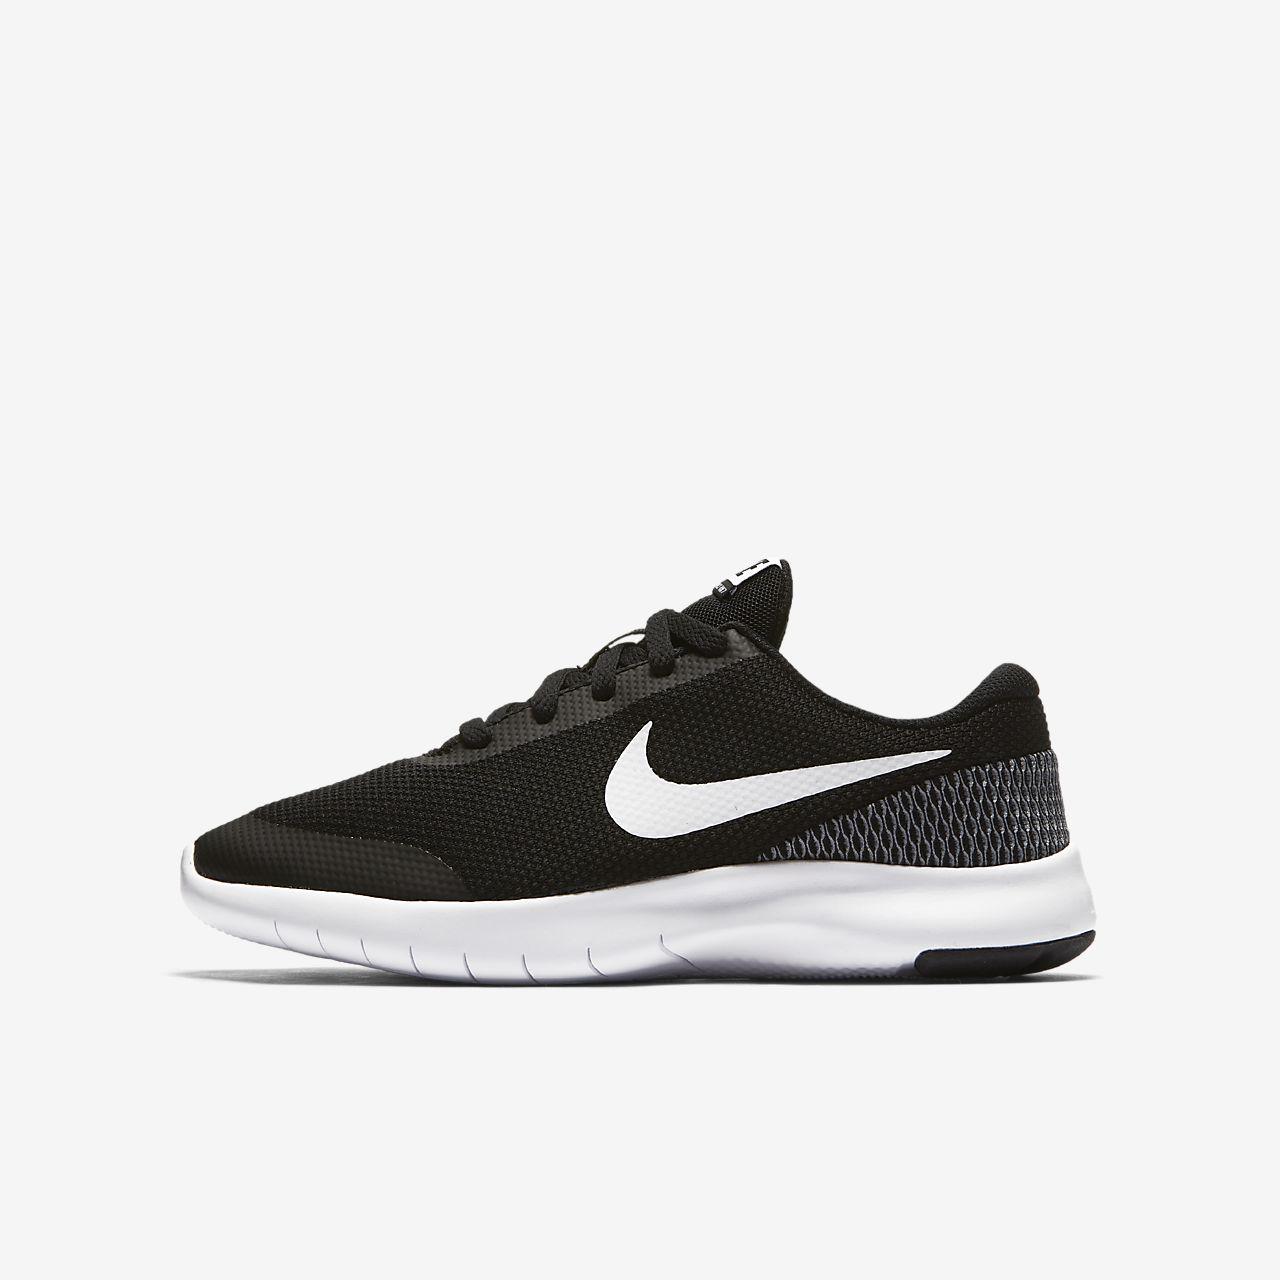 5c65840d954e Nike Flex Experience Run 7 Older Kids  Running Shoe. Nike.com NO